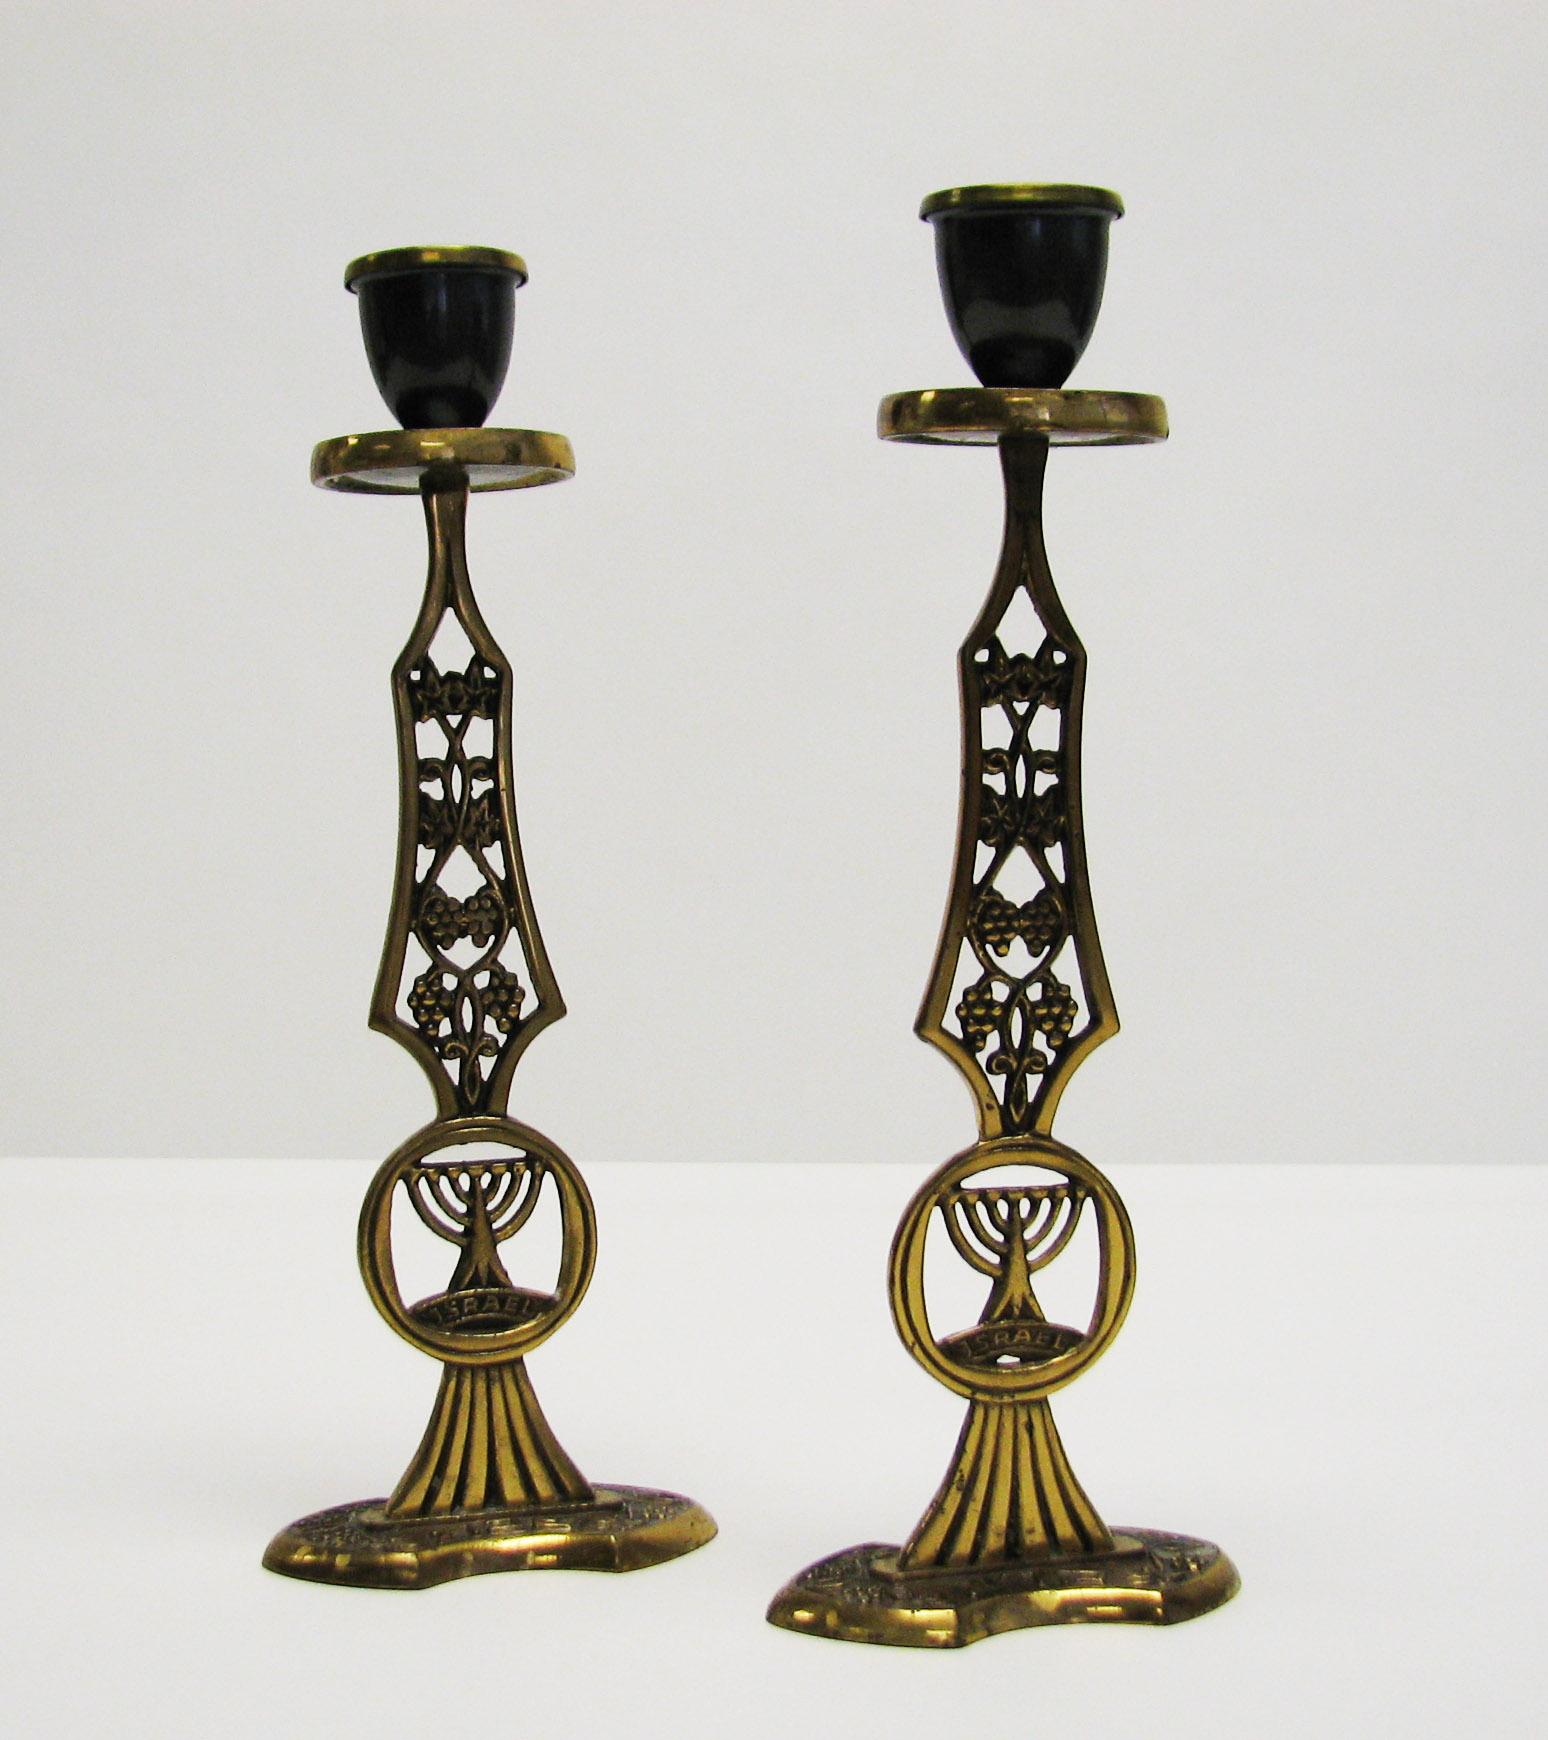 Shabbat Candle Holders